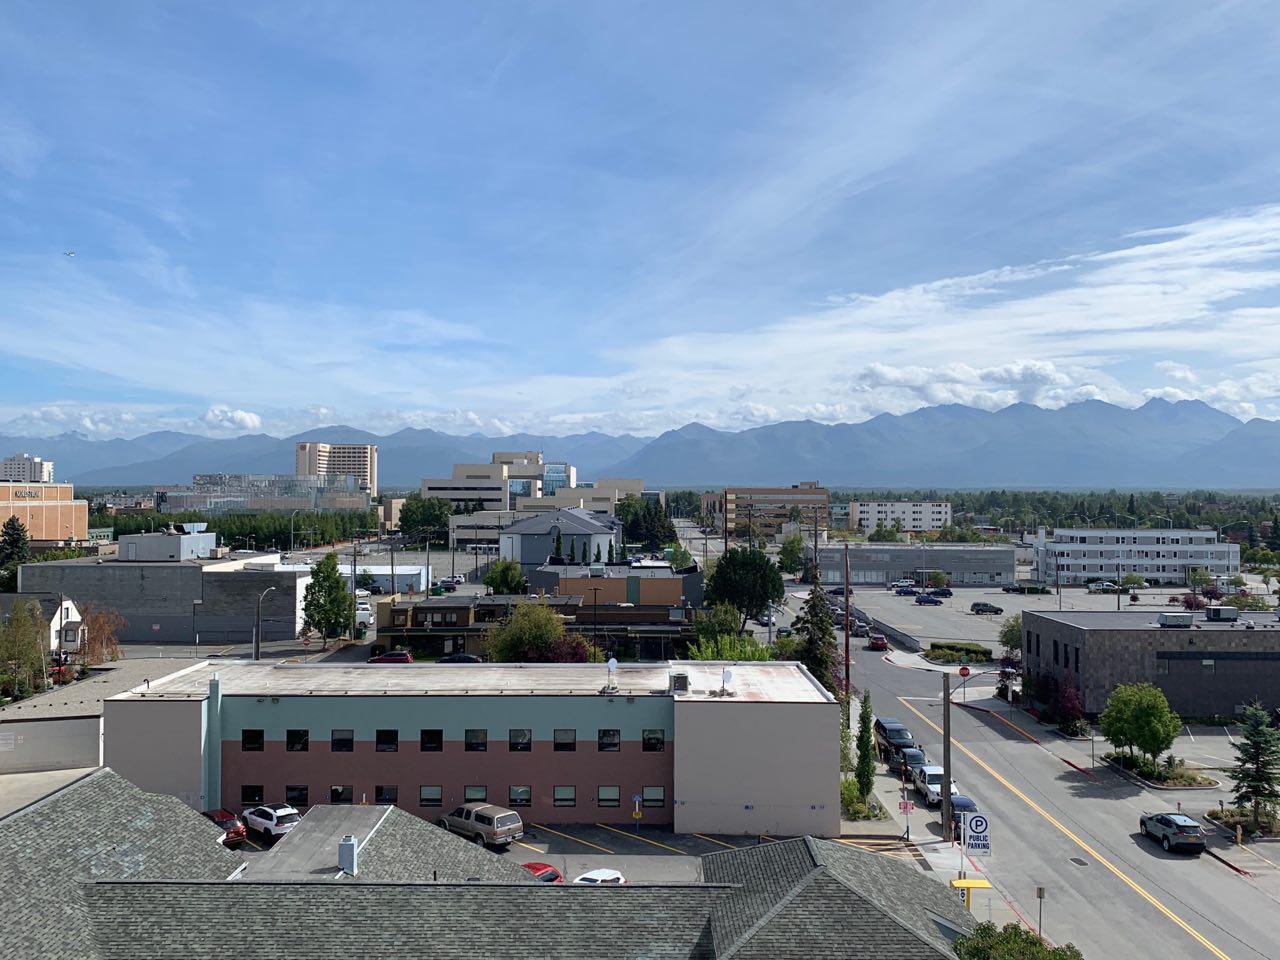 Трип на Аляску, или KDD'19 глазами очевидца - 5